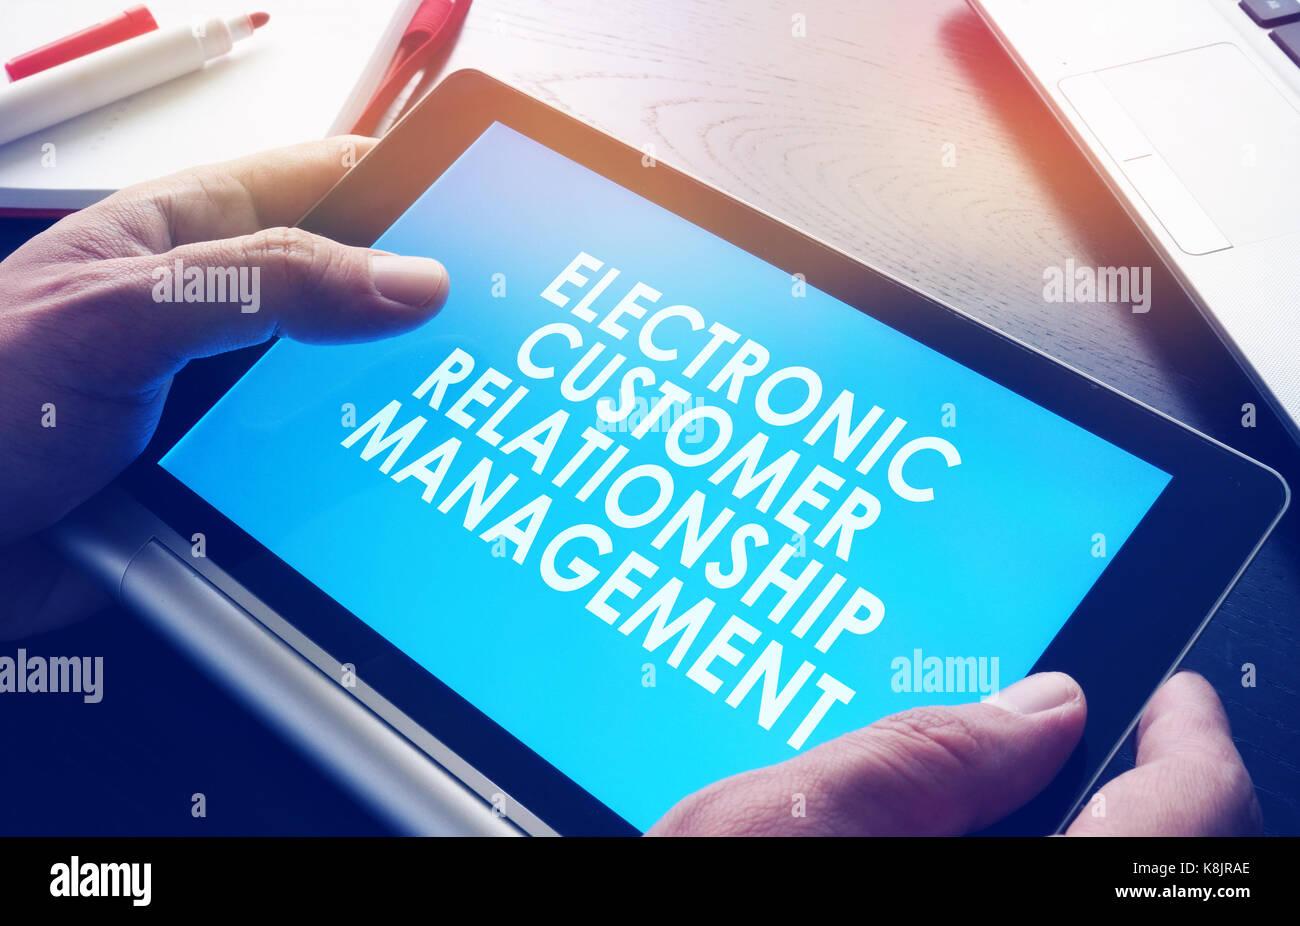 ECRM electronic customer relationship management. - Stock Image